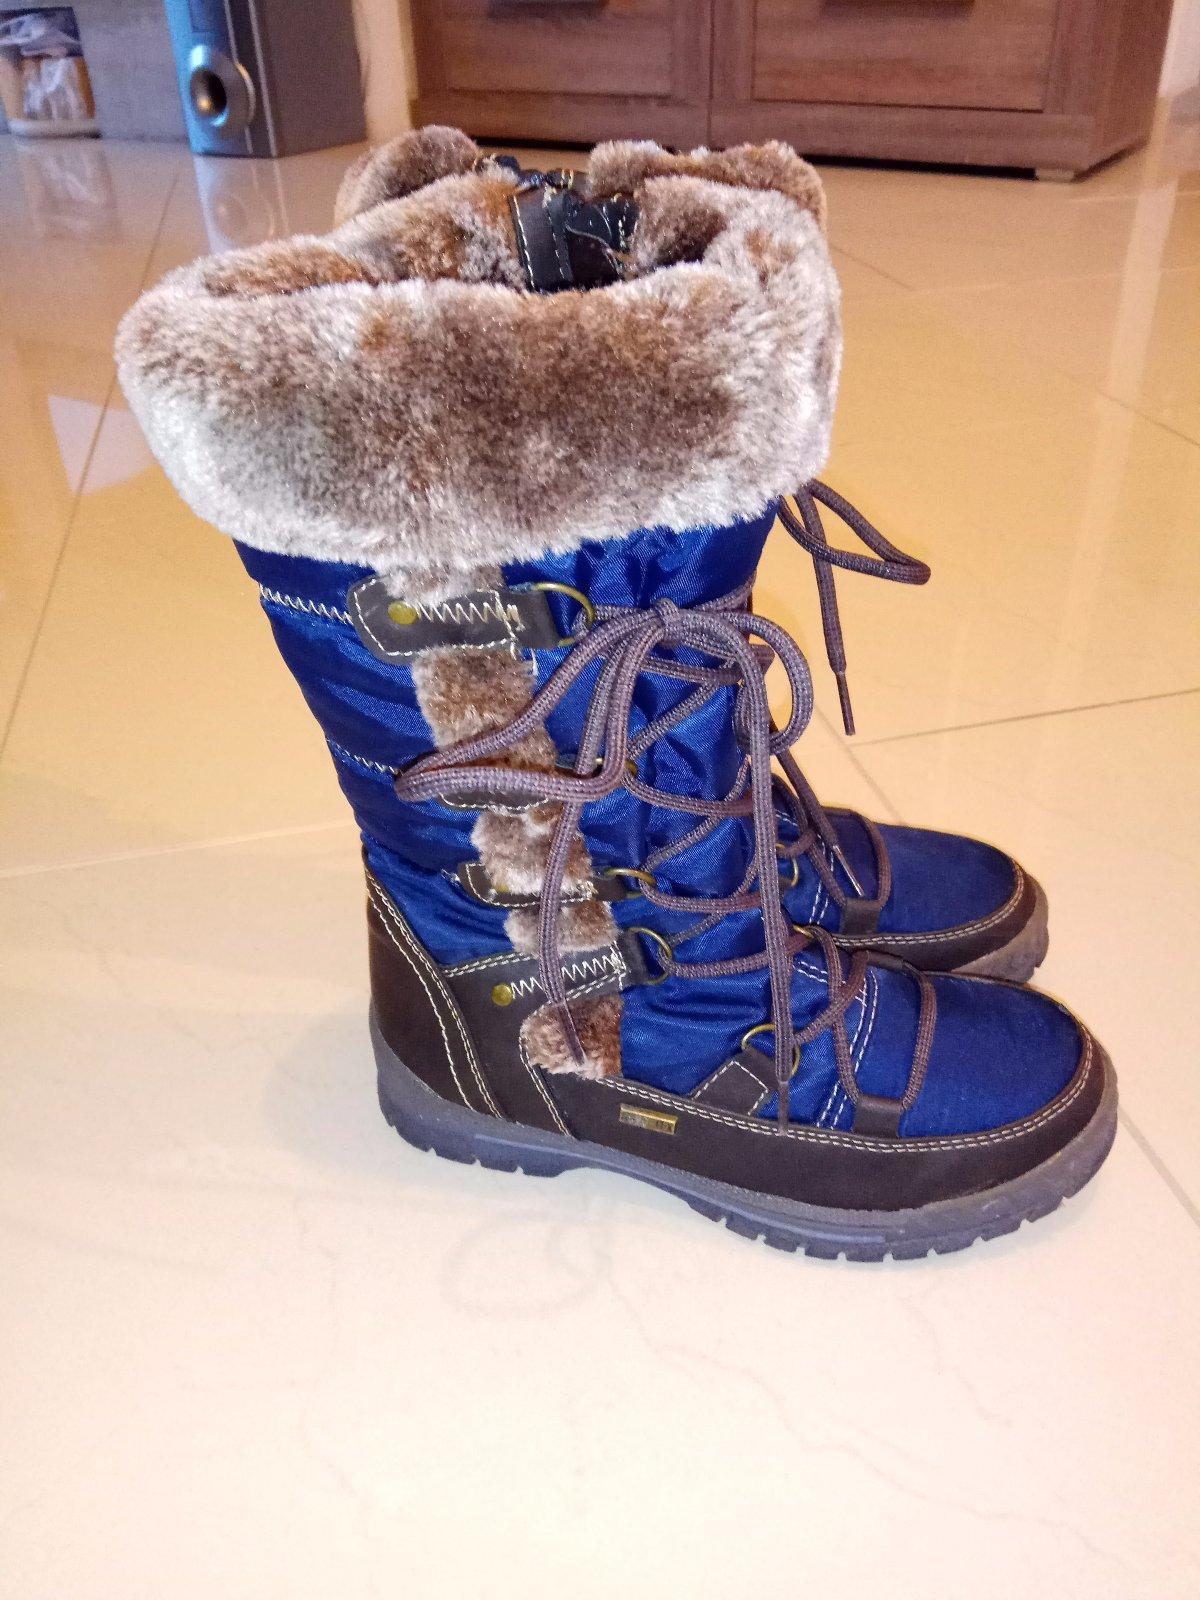 Dievčenské teplé čižmy - snehule fd1d157edbe